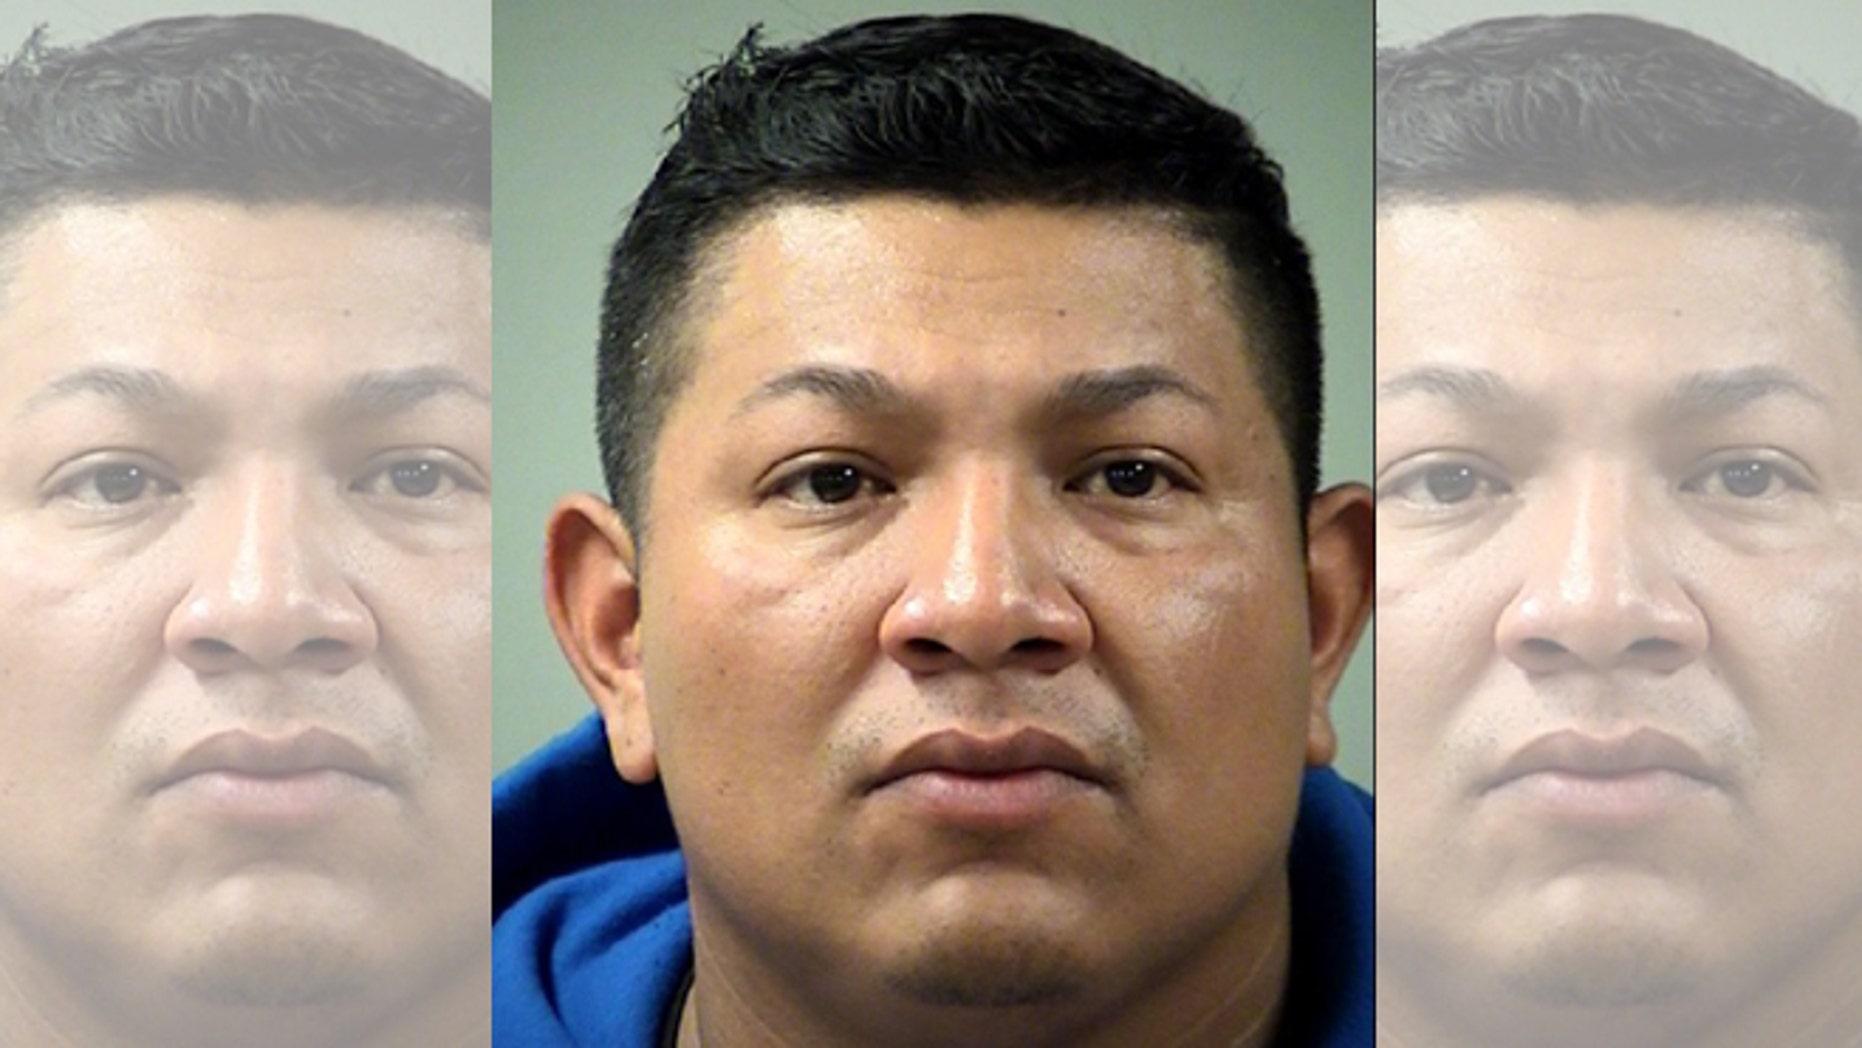 Martin Gutierrez Jr. (Photo: Bexar County Sheriff's Office)